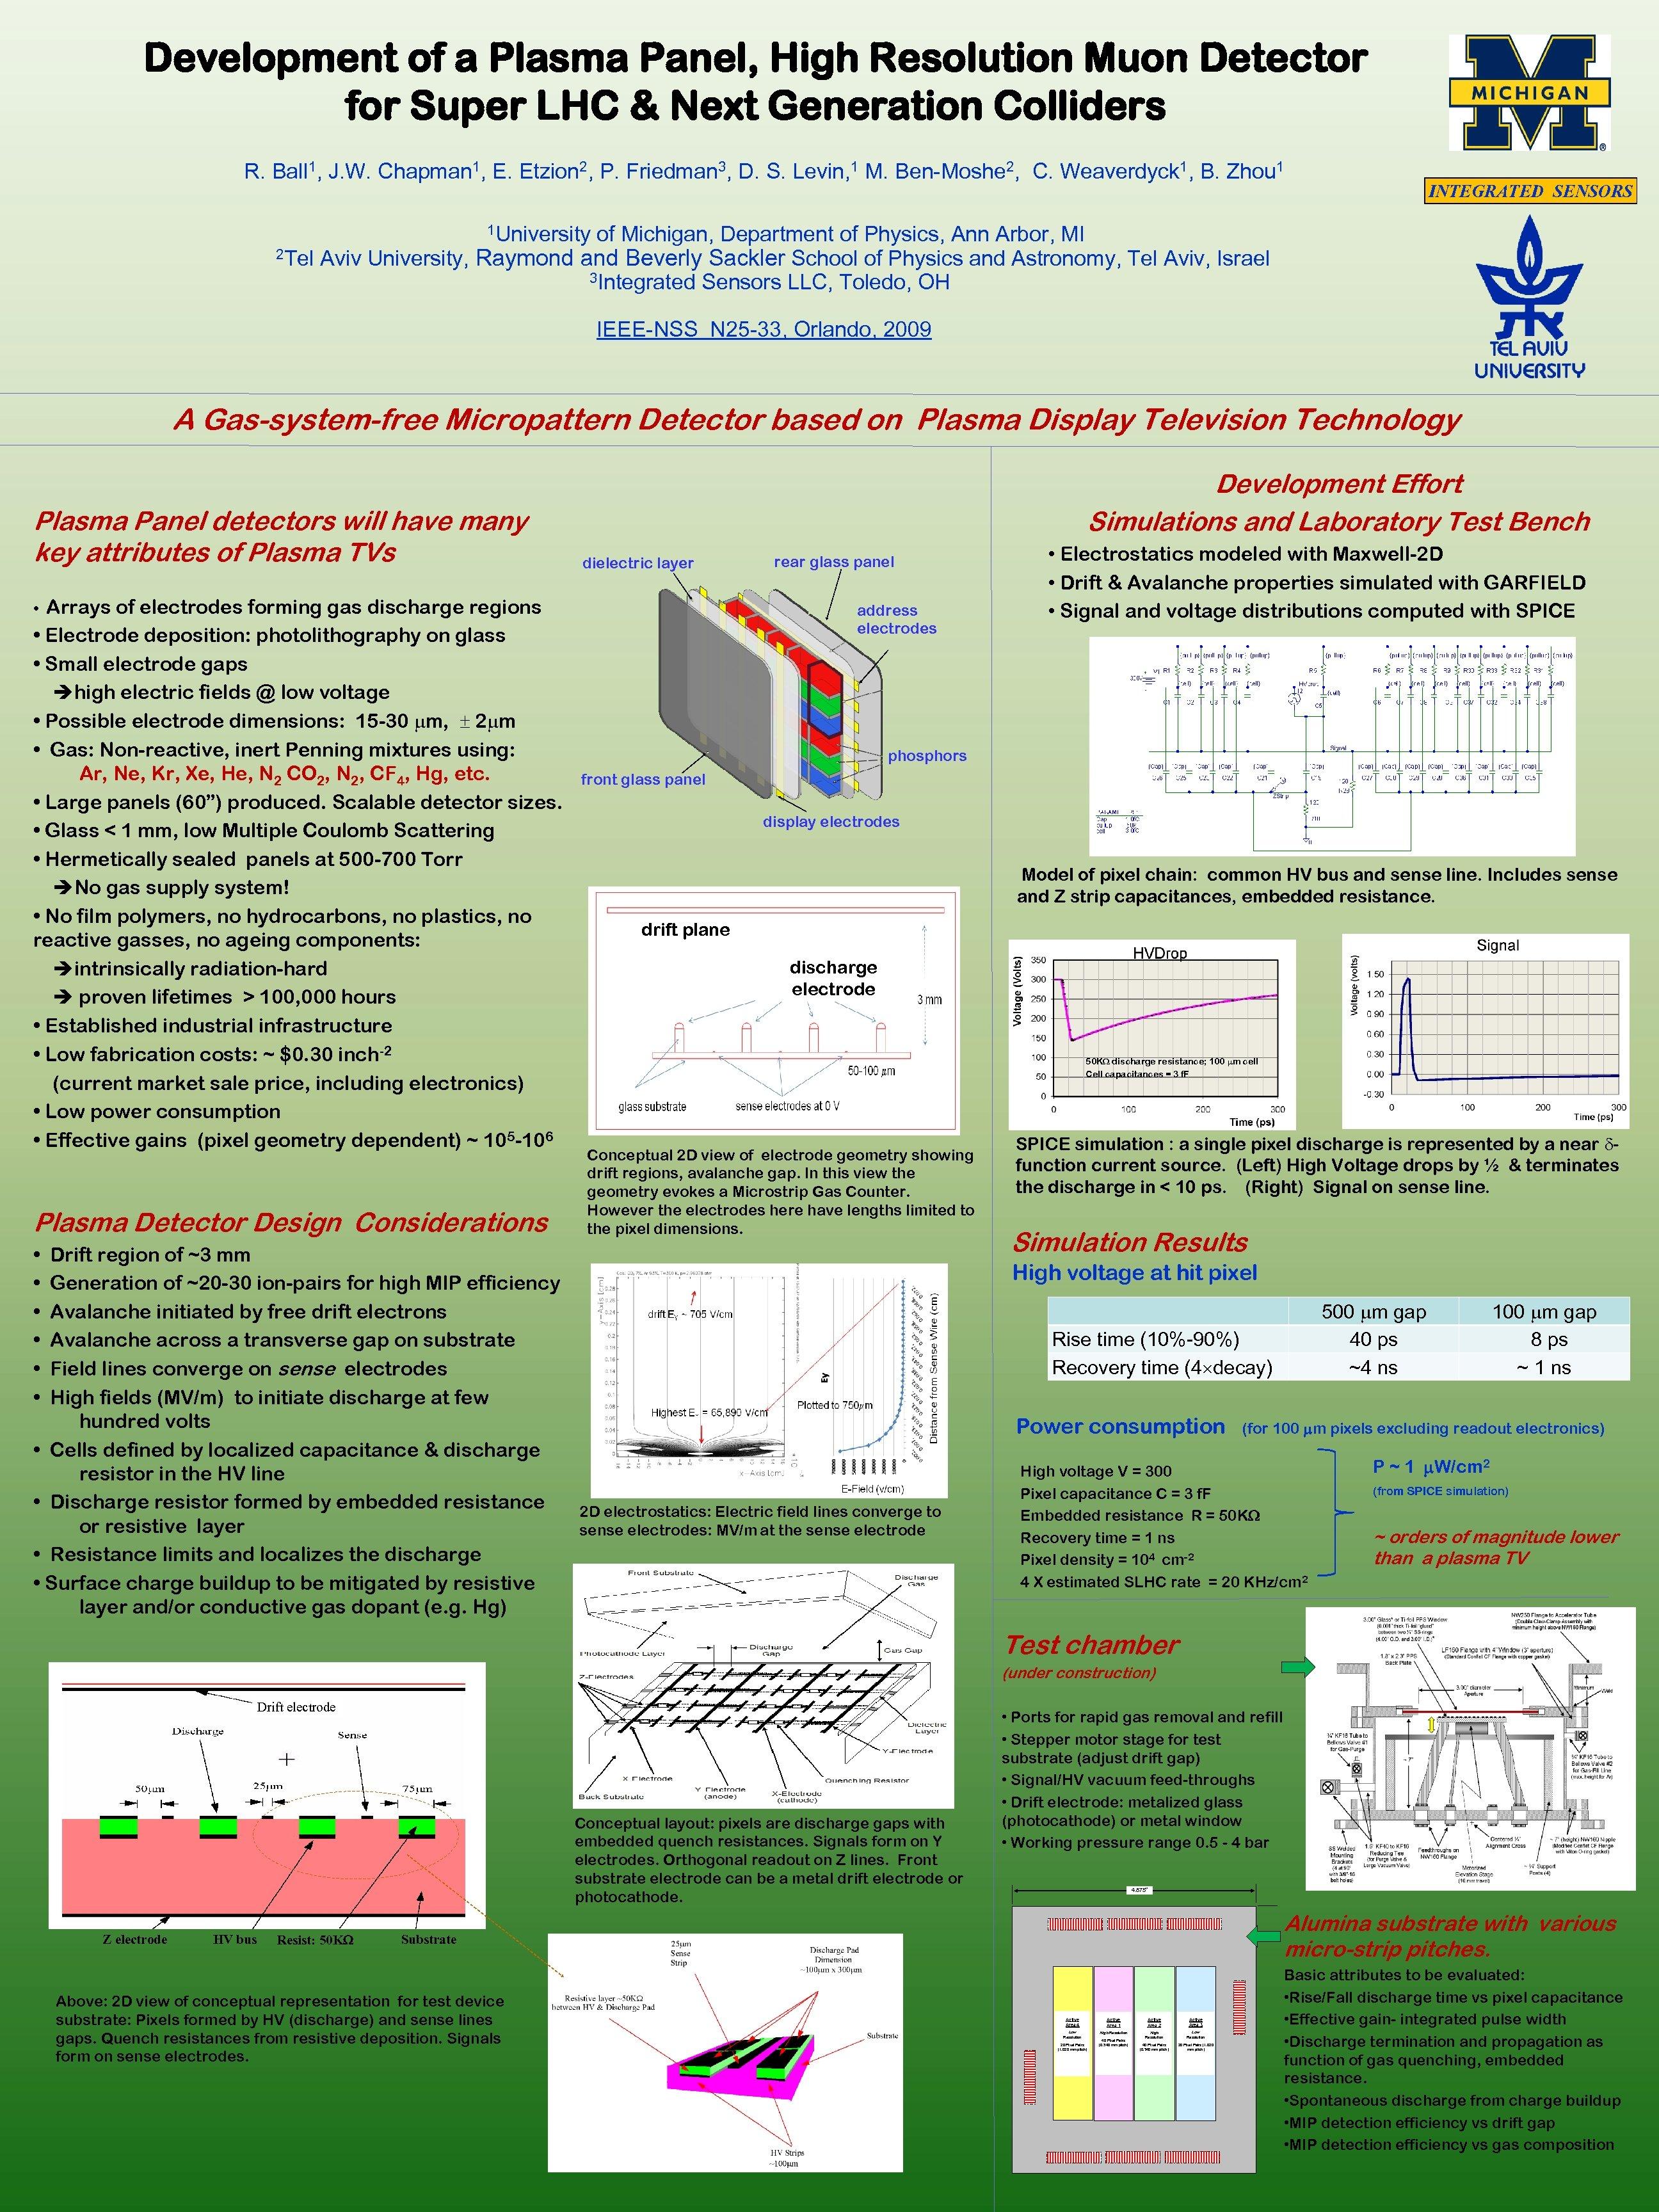 Development of a Plasma Panel, High Resolution Muon Detector for Super LHC & Next